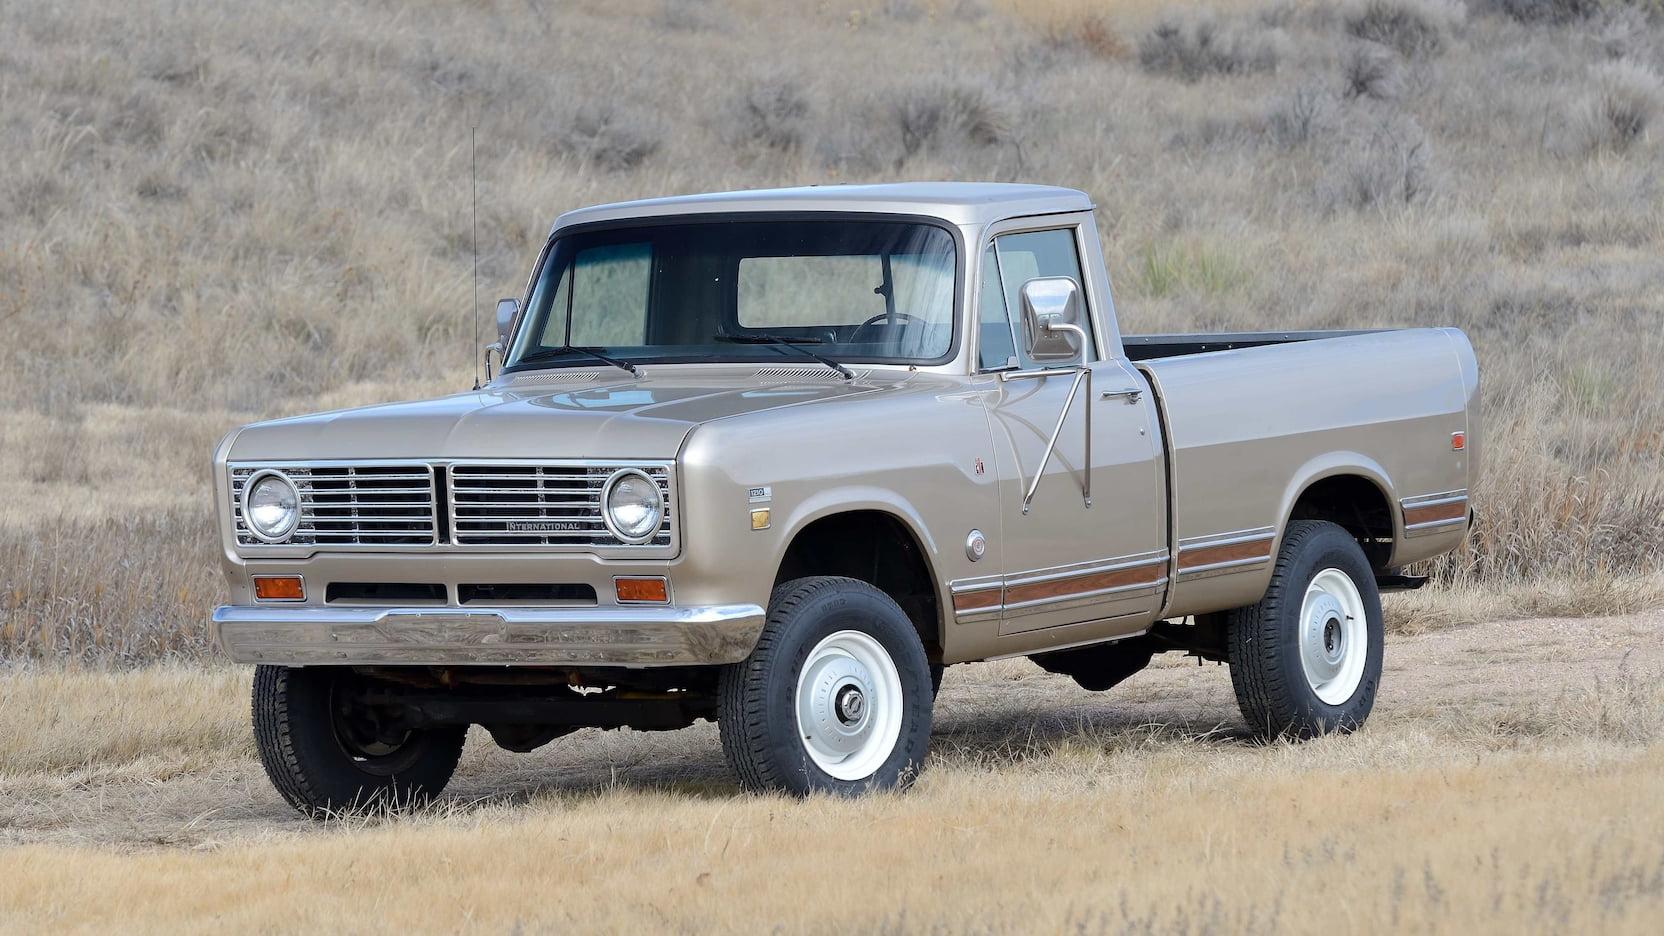 1972 International Harvester 2110 Pickup